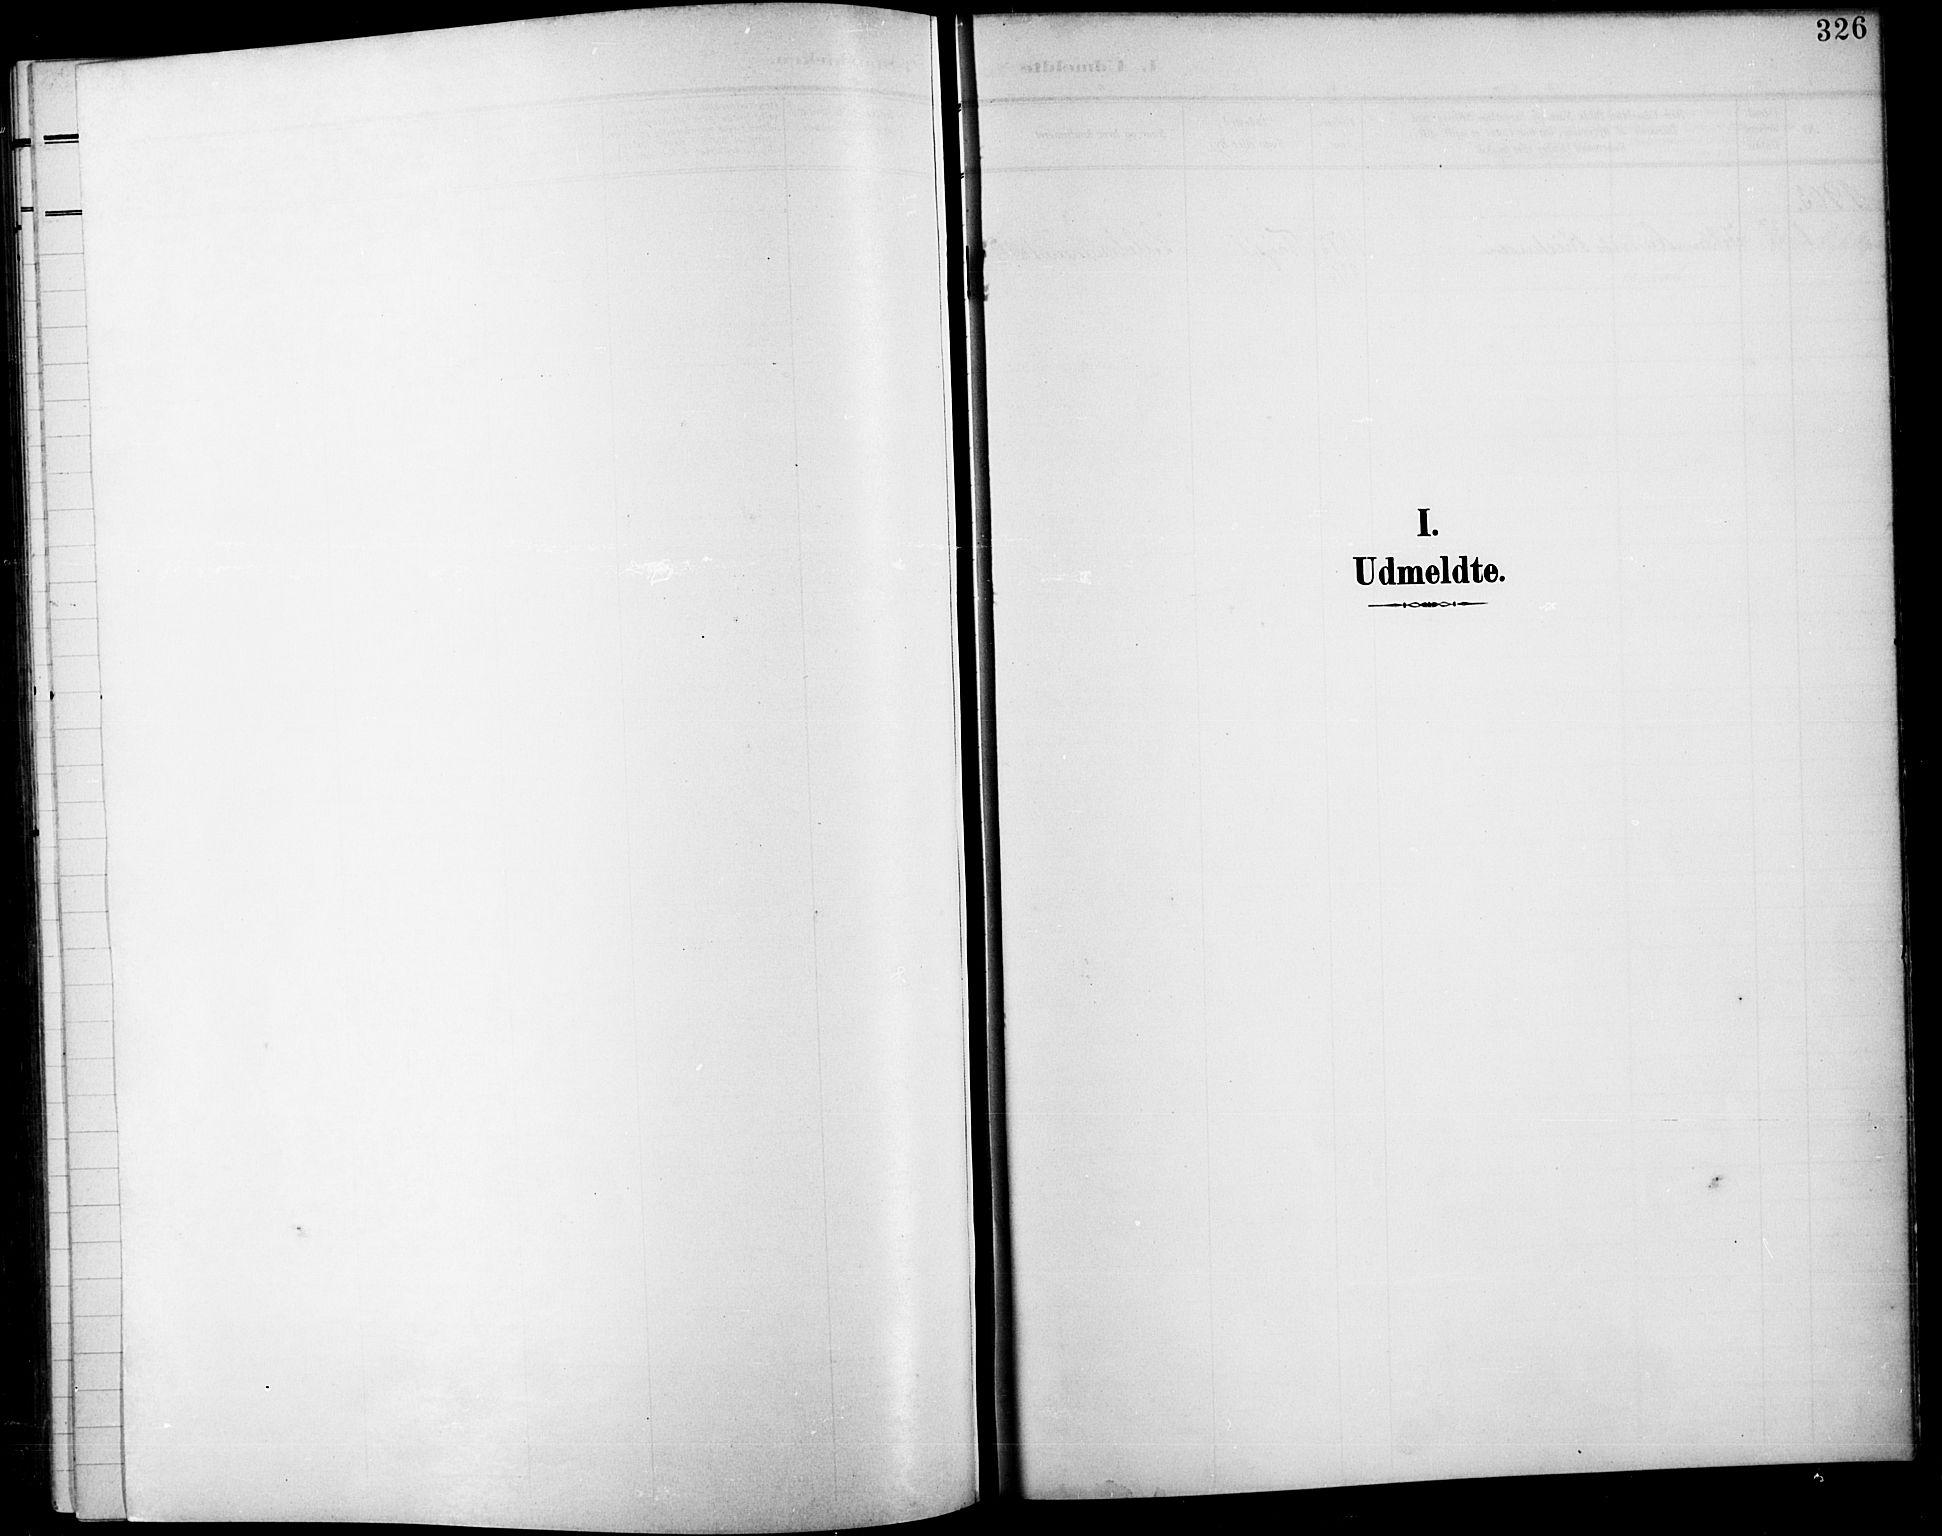 SAH, Fåberg prestekontor, H/Ha/Hab/L0012: Parish register (copy) no. 12, 1903-1924, p. 326